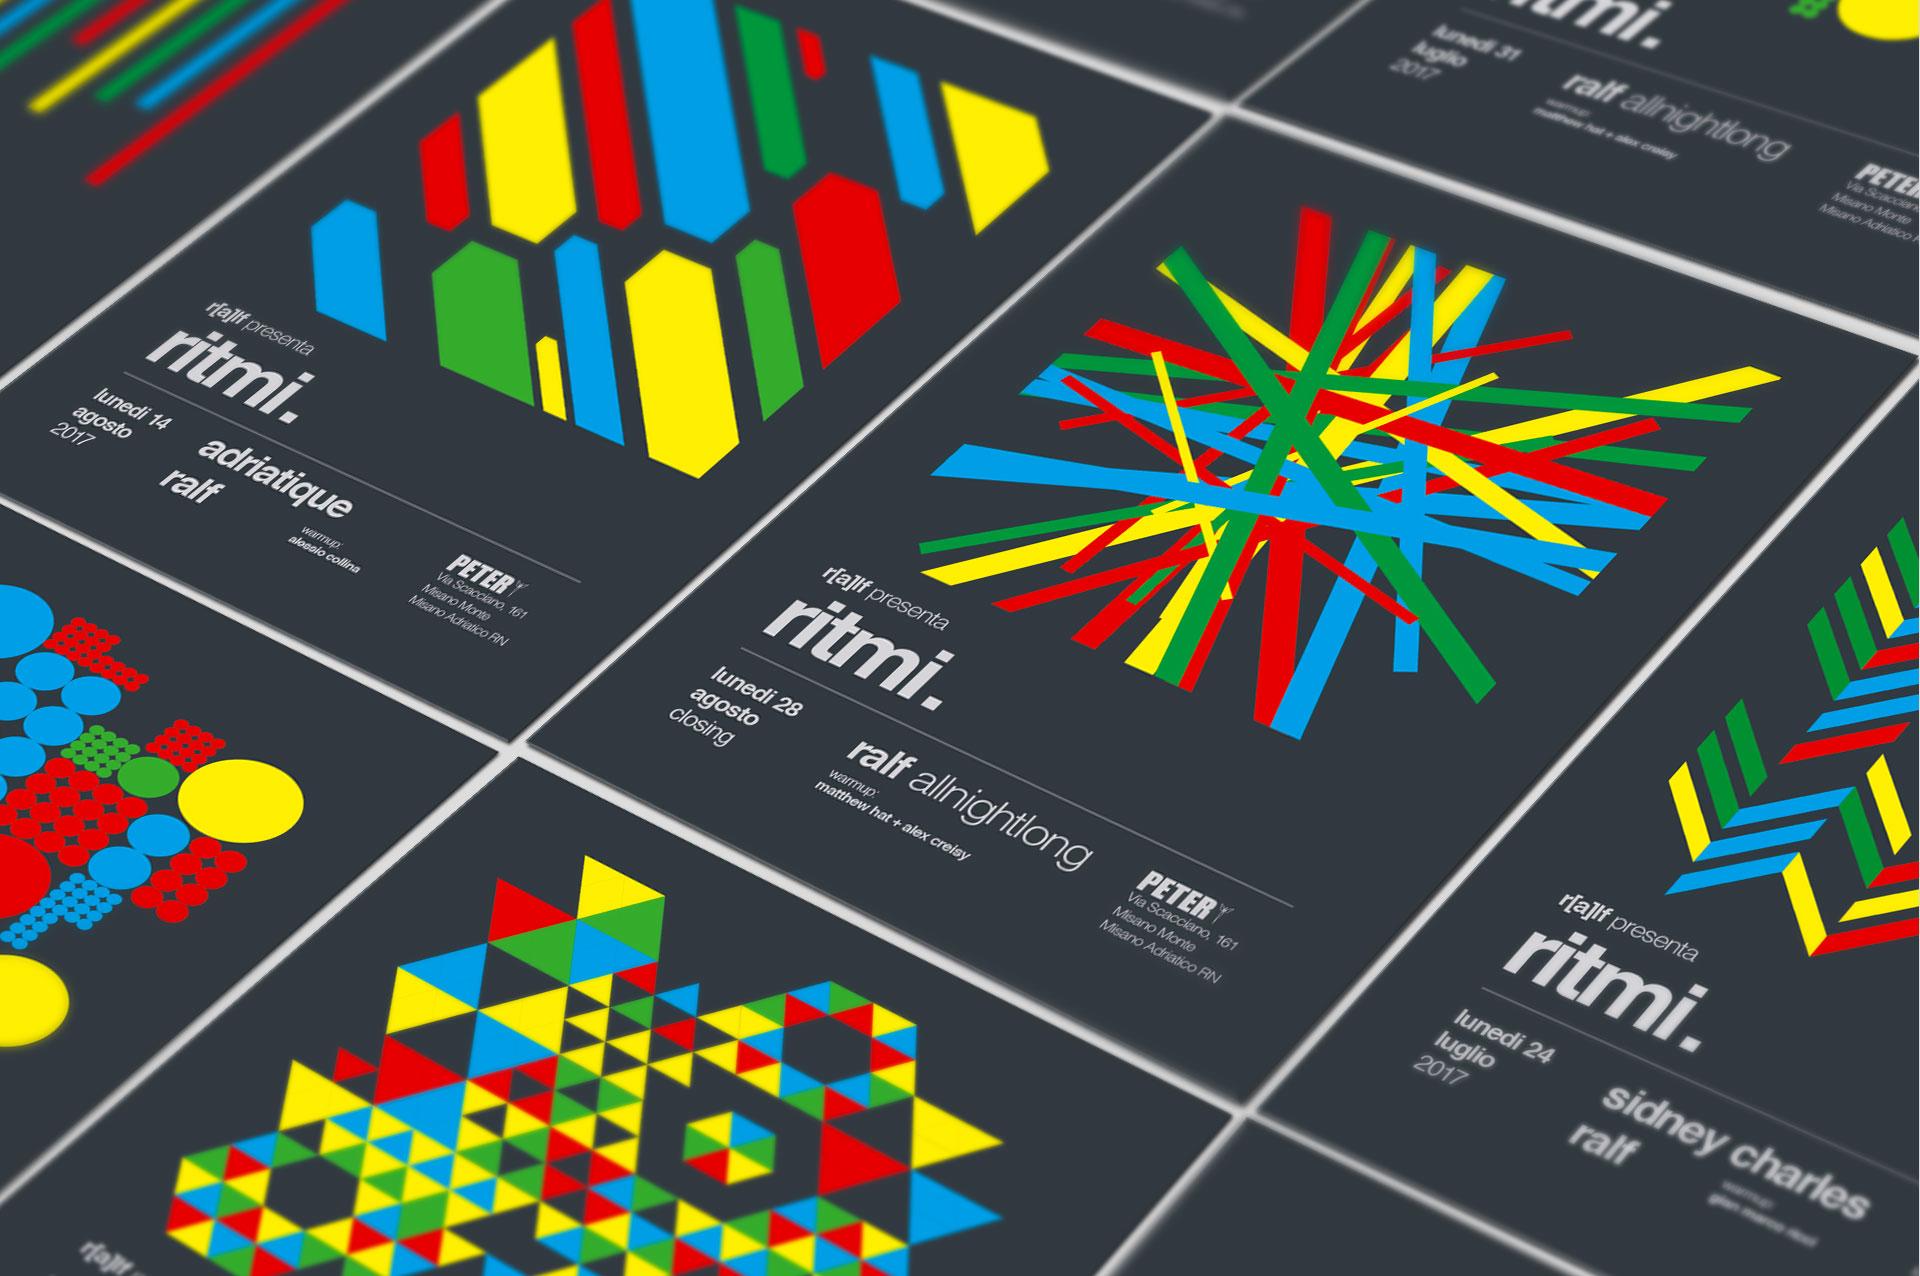 ritmi-flyers-graphic-design-zerouno5